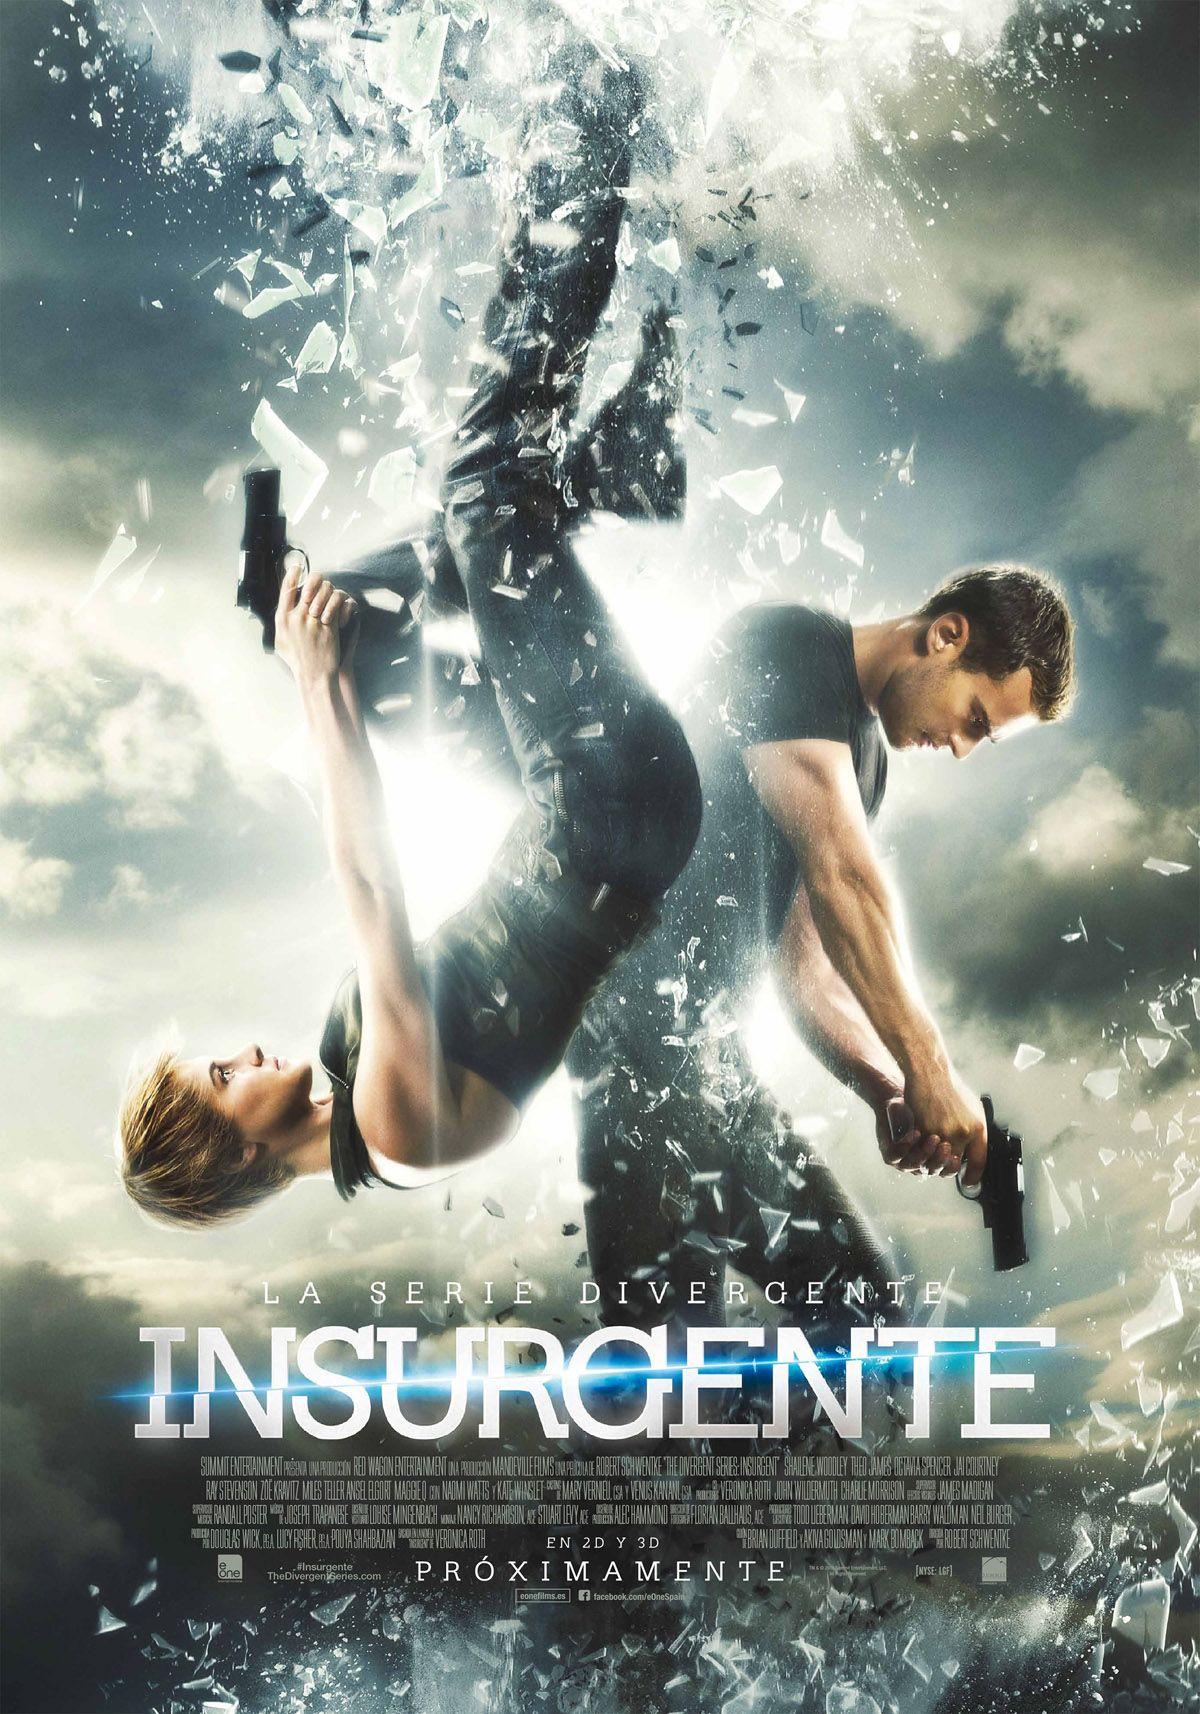 Insurgente Enregistrament Video Dirigida Por Robert Schwentke S L Summit Cop 2015 Serie Divergente Divergente Insurgente